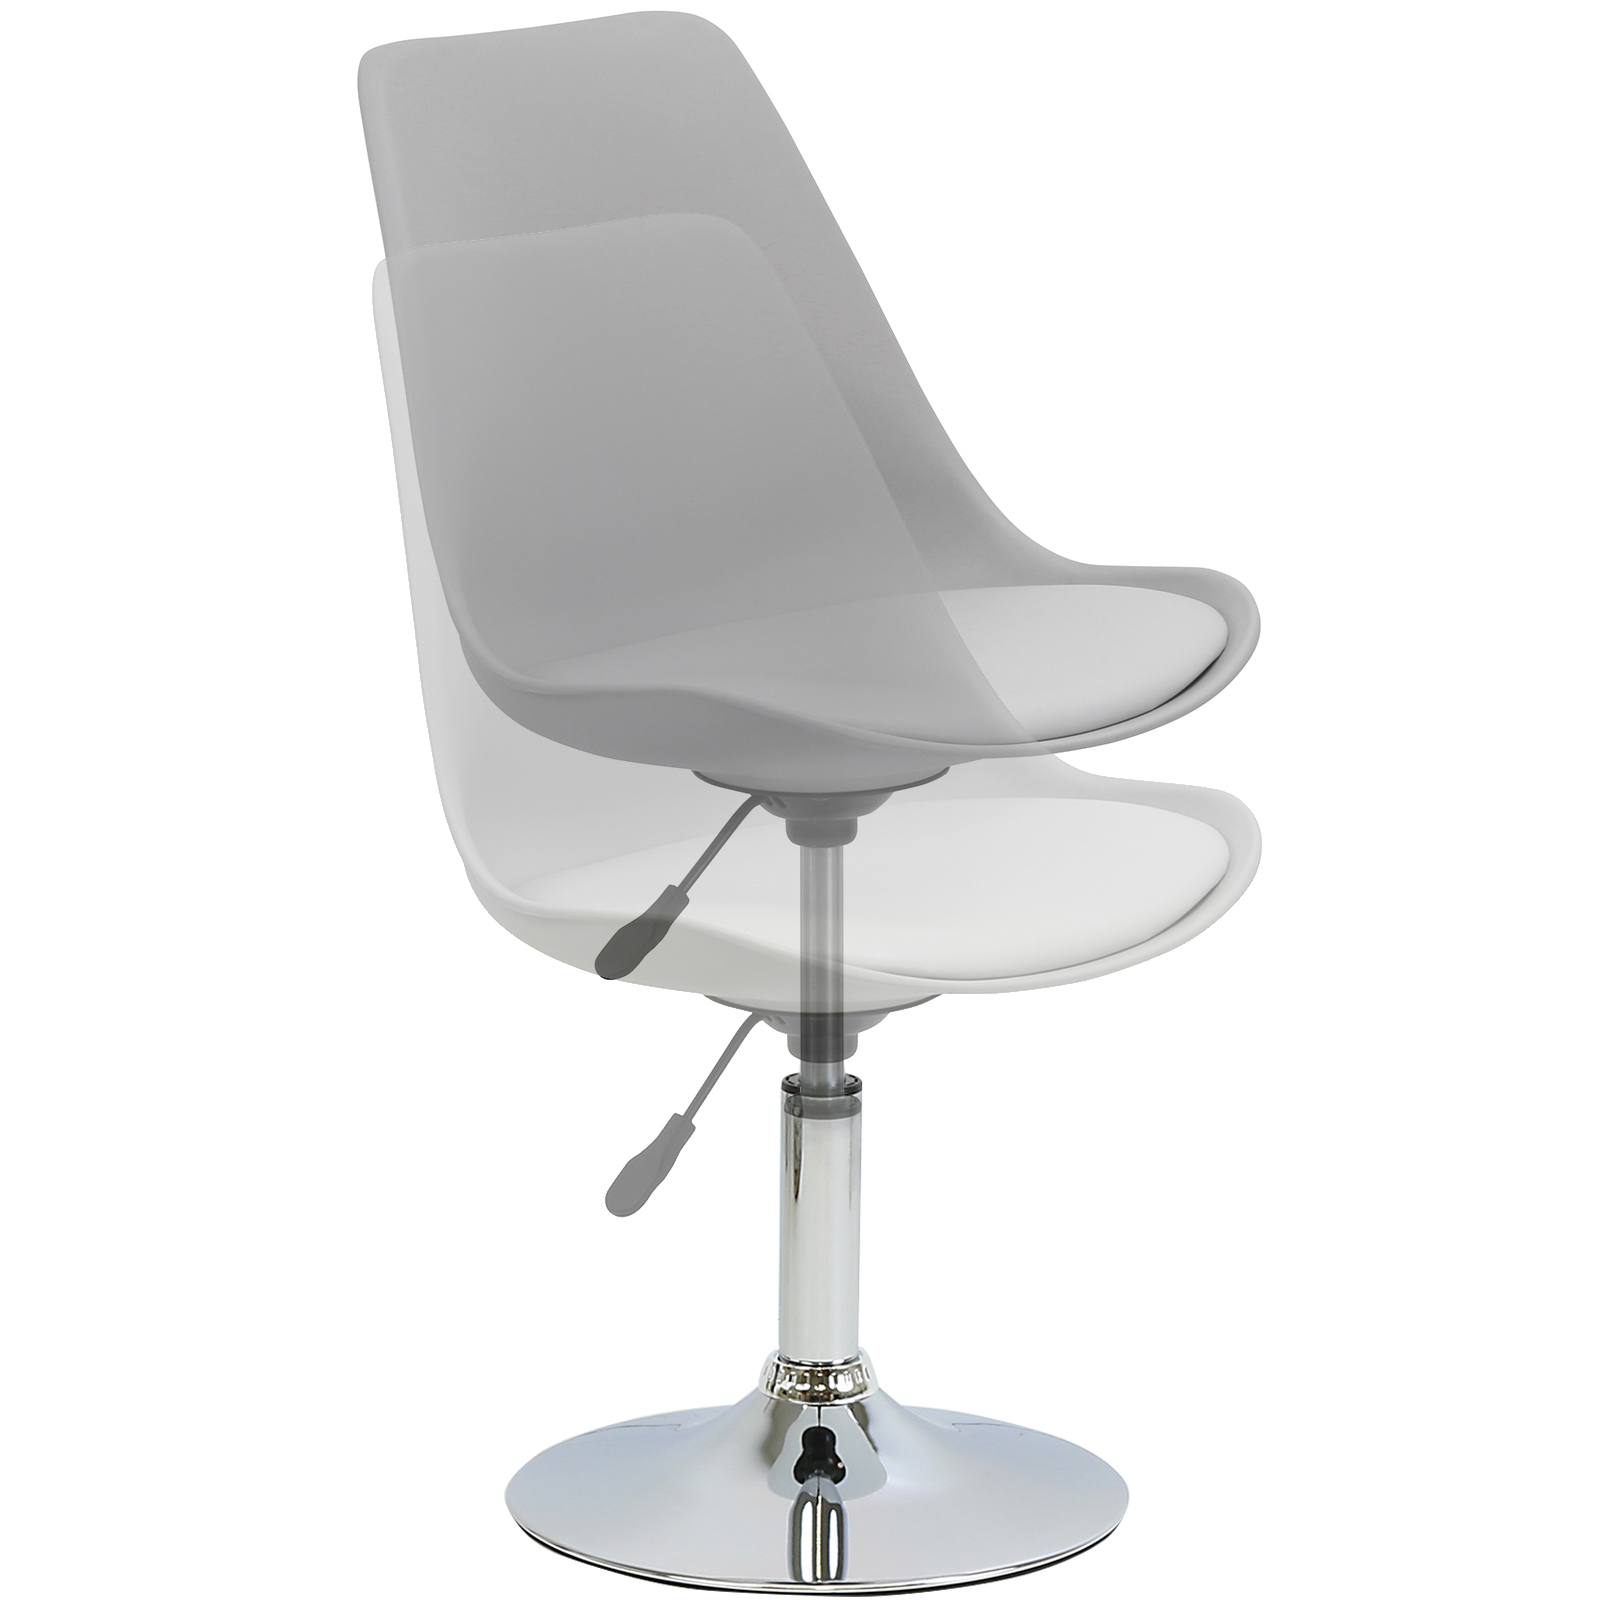 HARTLEYS GREY SEAT TULIP SWIVEL DESK RECEPTION DINING  : CHR031G from www.ebay.co.uk size 1600 x 1600 jpeg 404kB